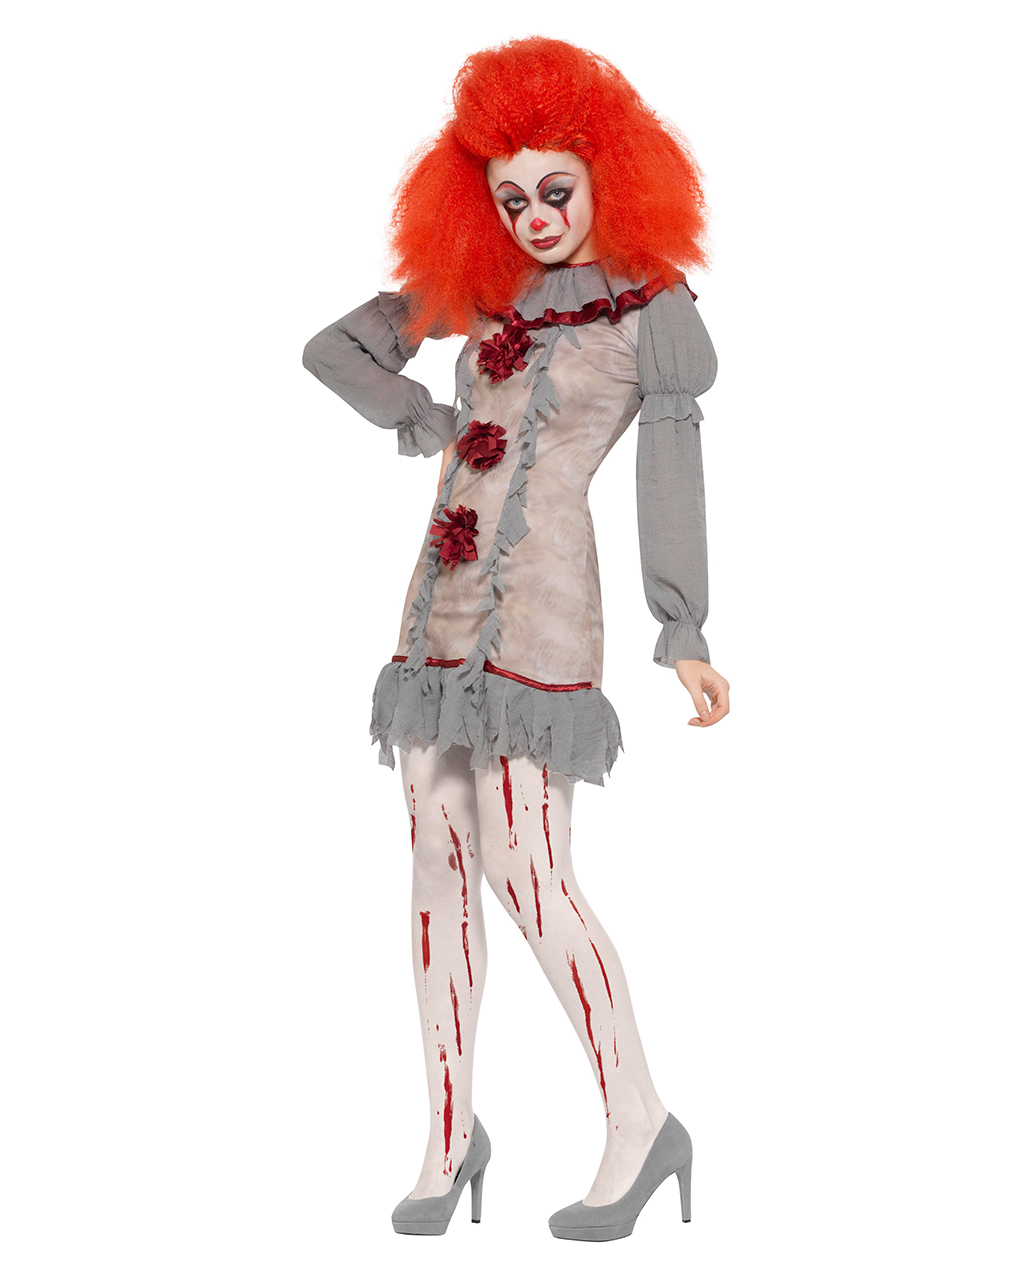 Halloween 3er Kostuem.Kostume Cod 325287 Psycho Clown Kostum Fur Damen Halloween Kostum Grau Rot Kleidung Accessoires